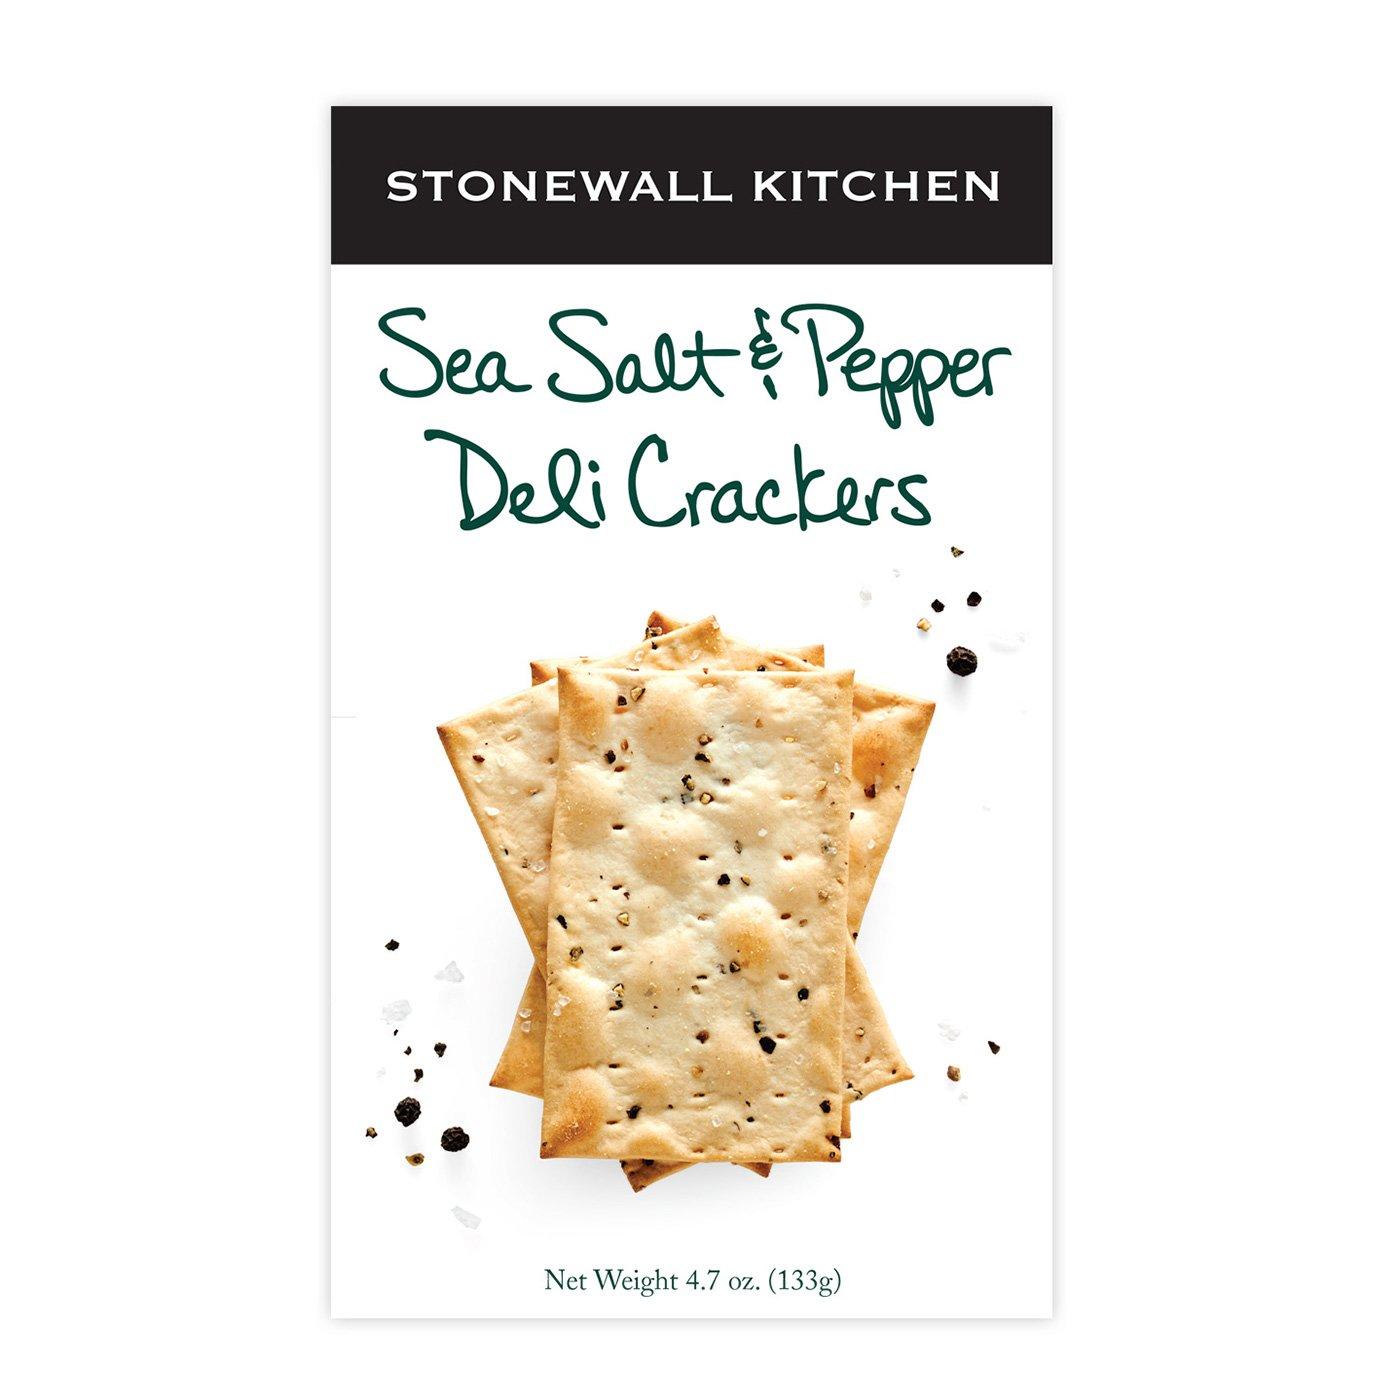 Stonewall Kitchen Sea Salt & Pepper Deli Cracker, 4.7 Ounce by Stonewall Kitchen